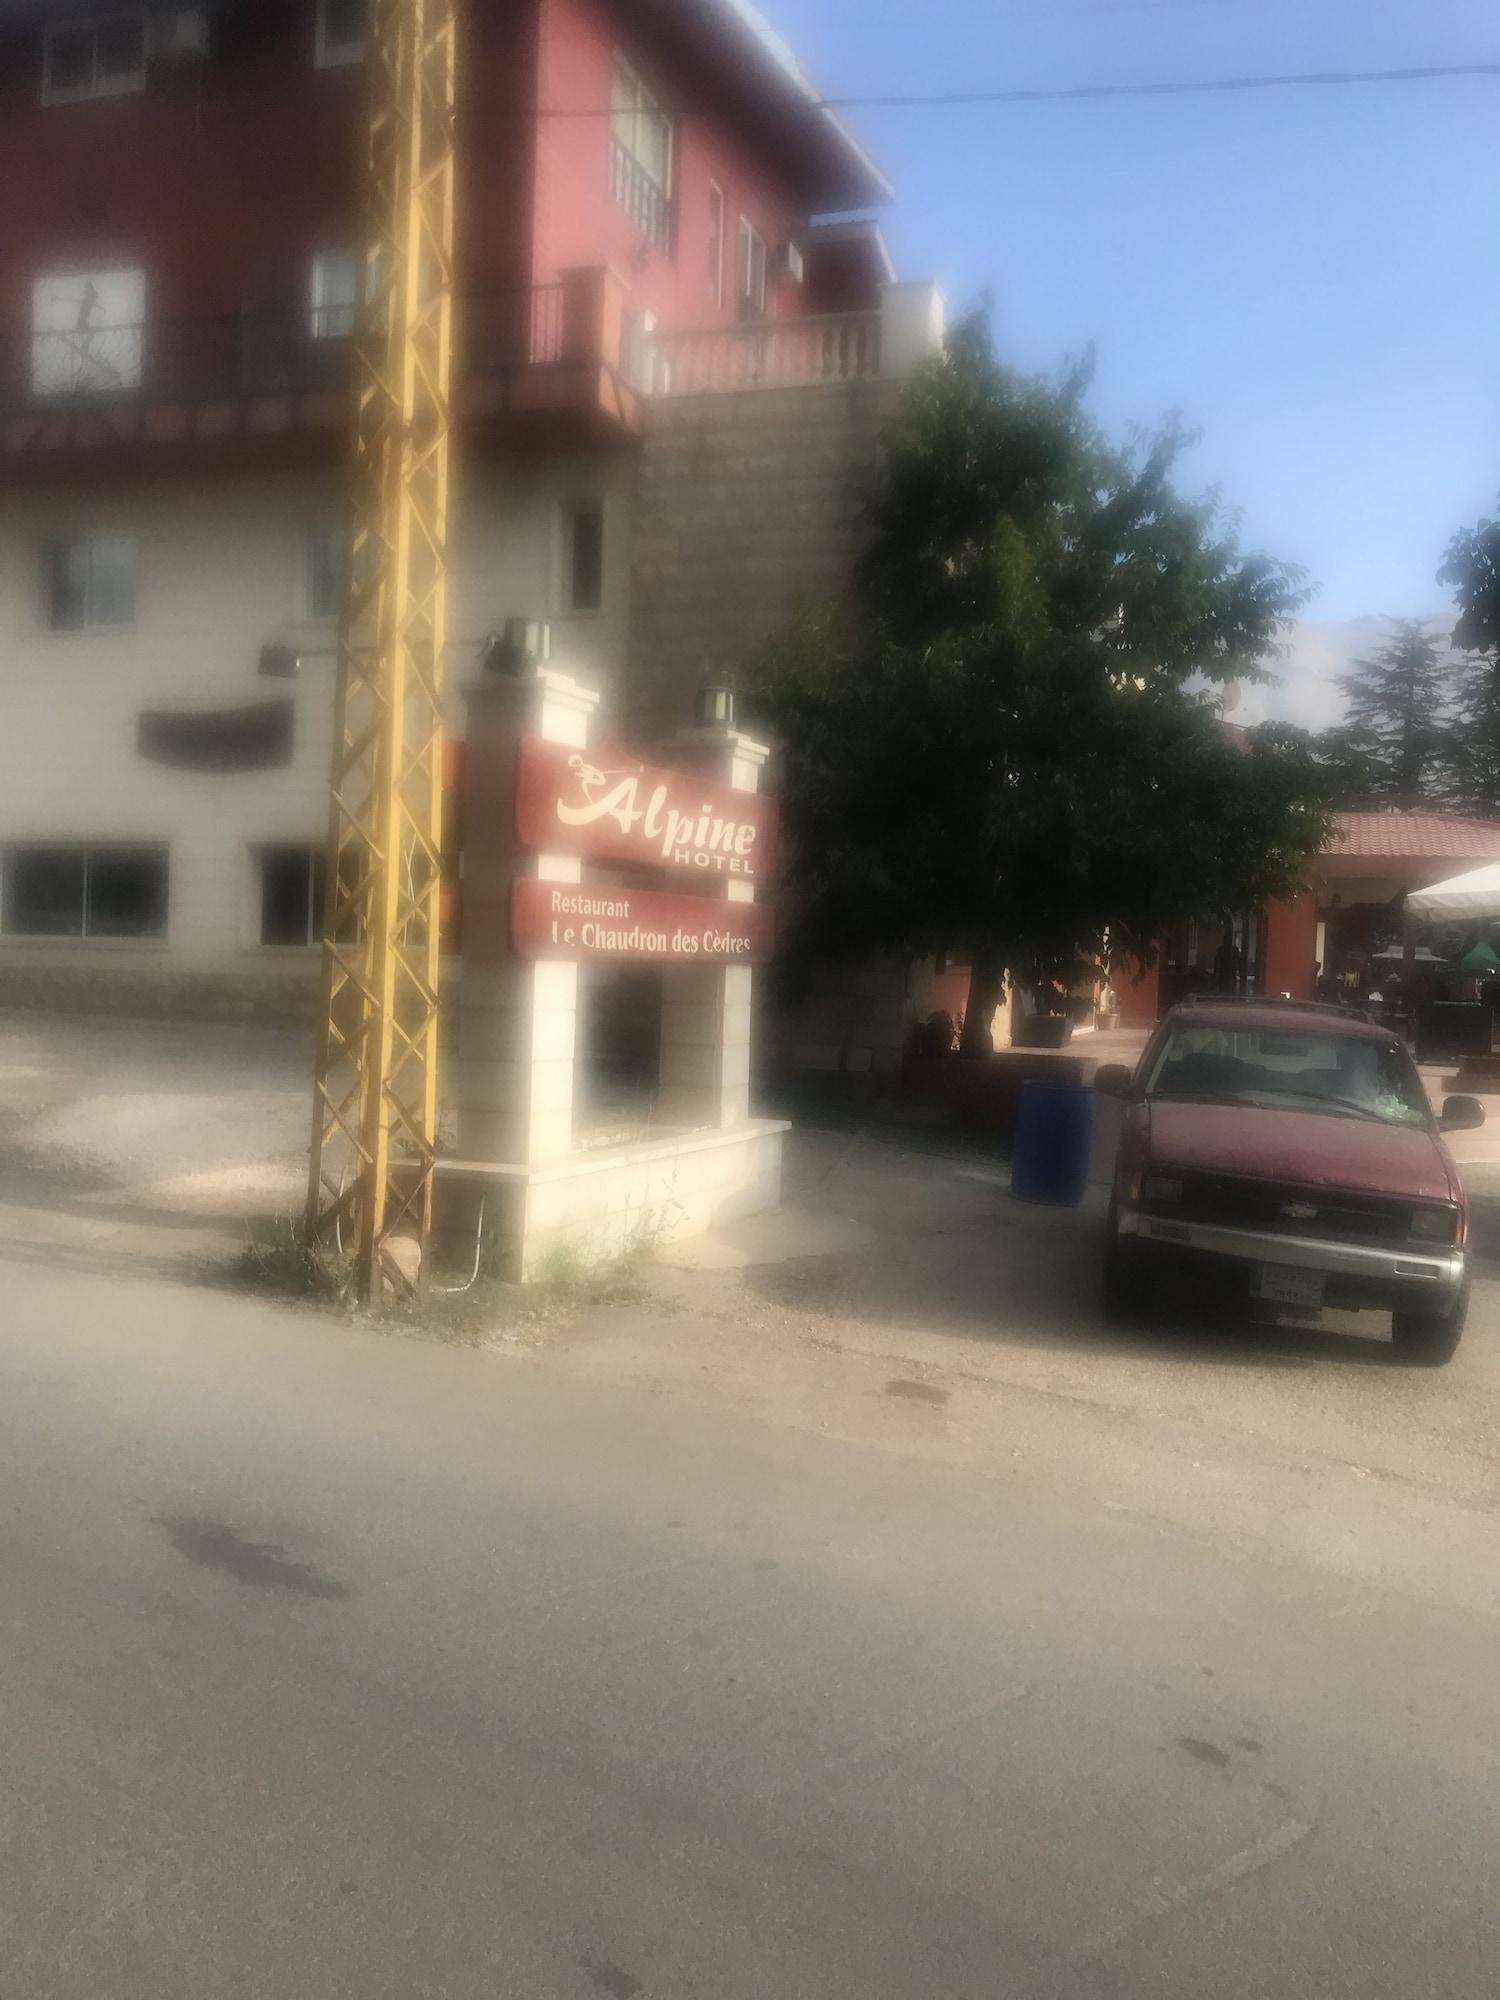 Alpine hotel cedars, Bcharre